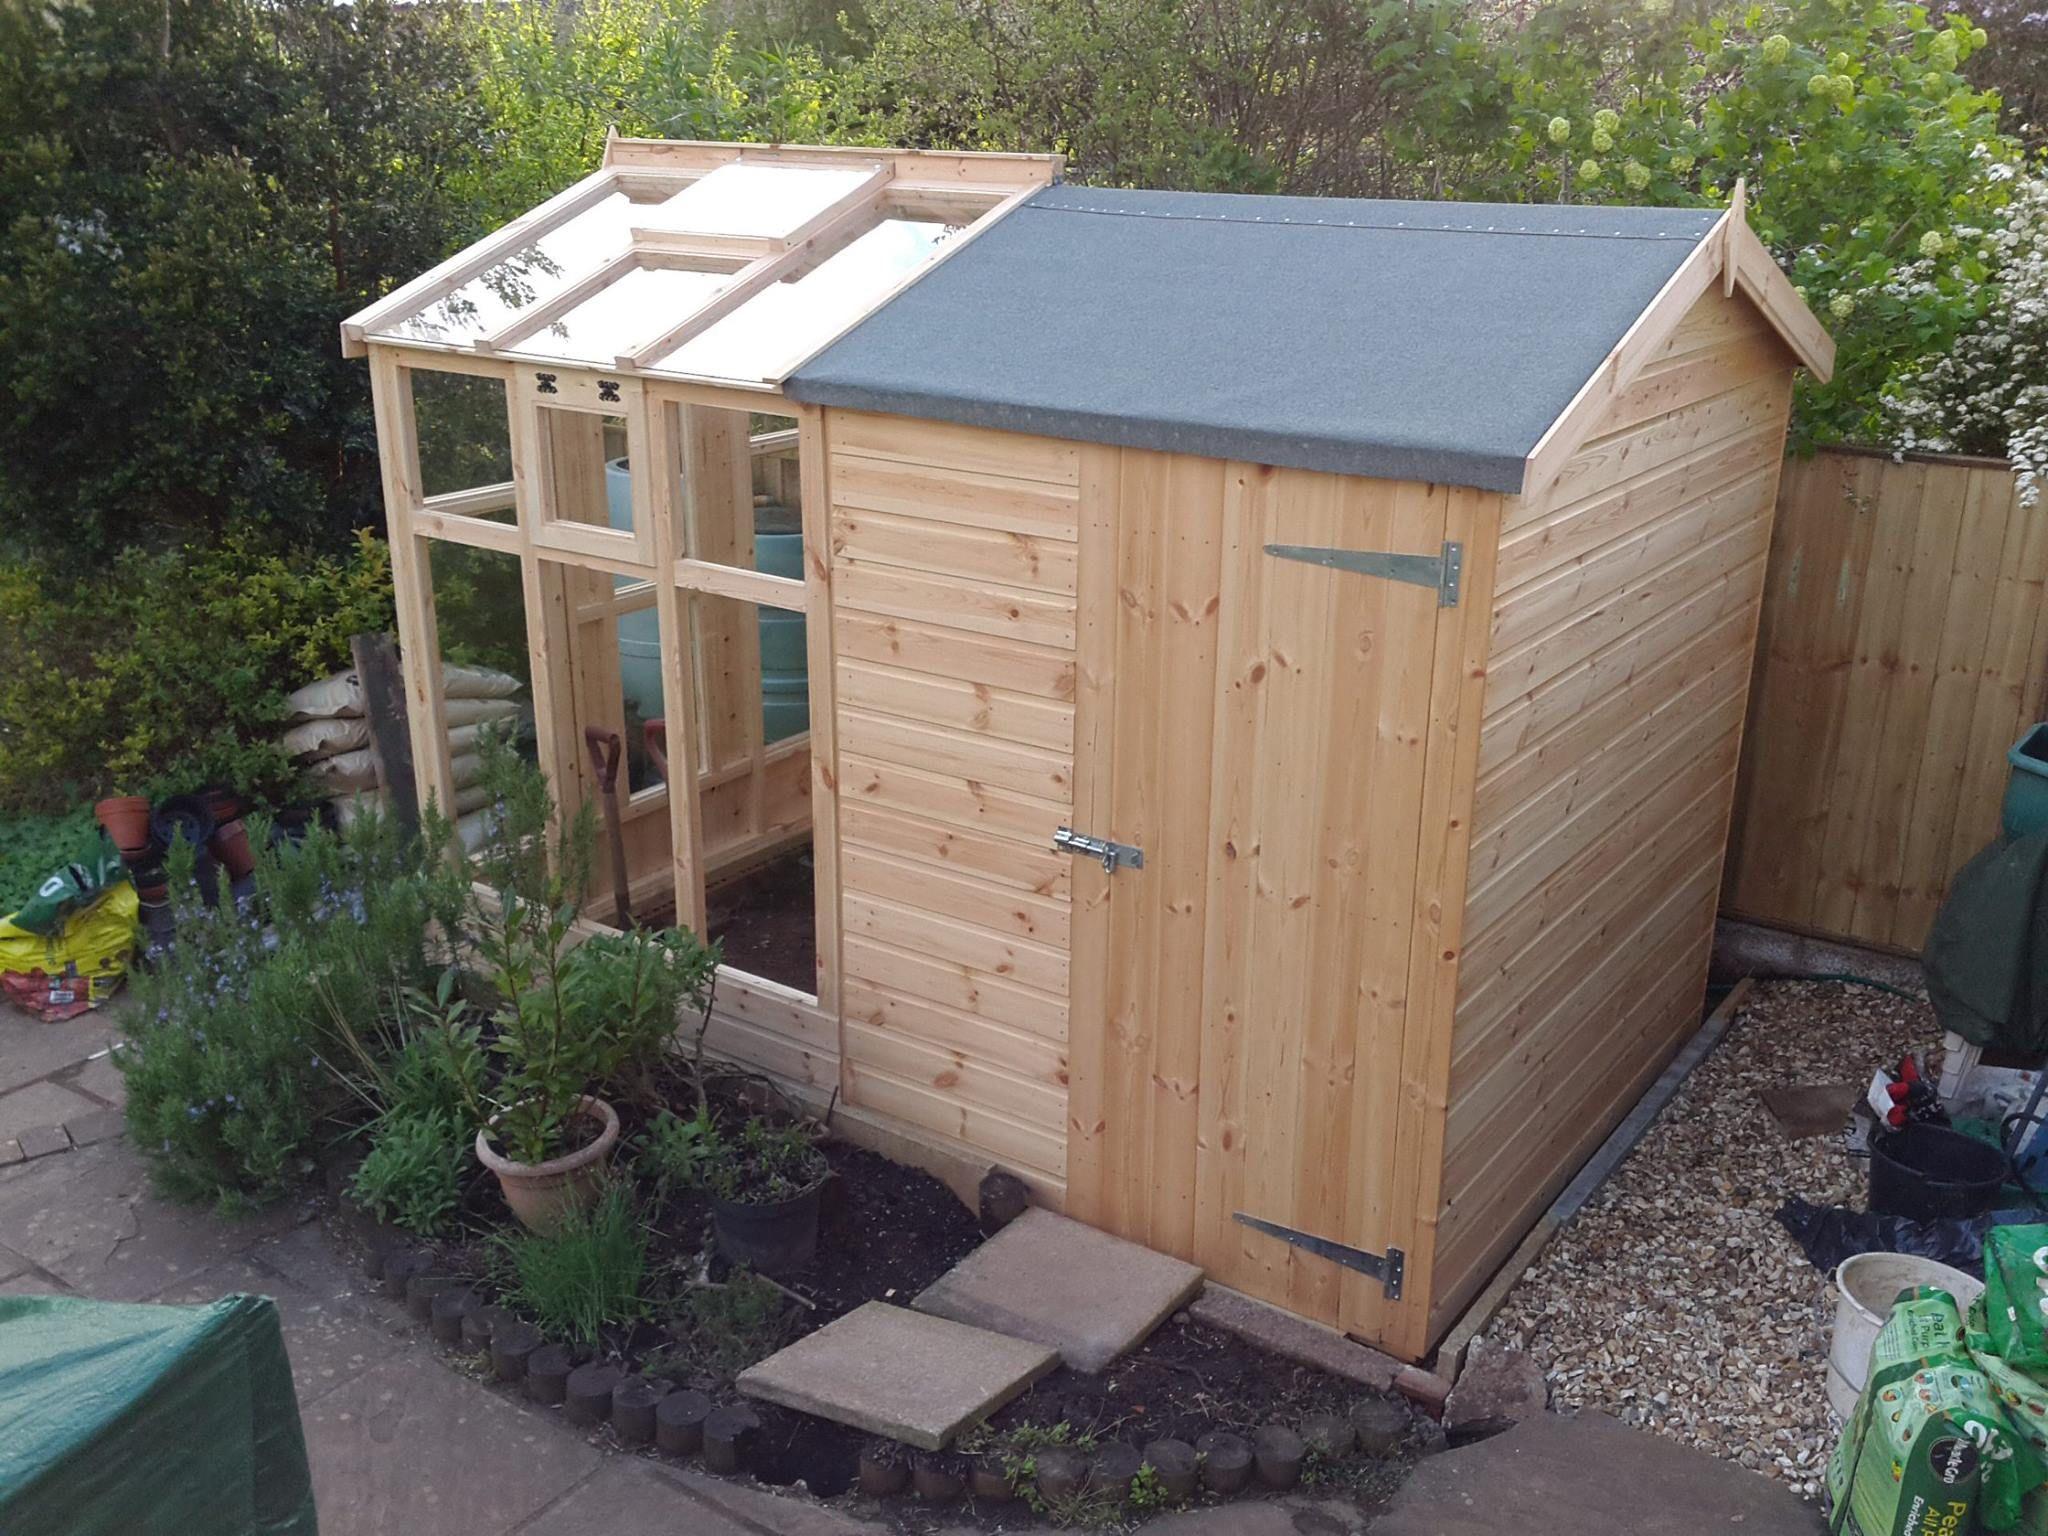 Backyard Shed Greenhouse Greenhouse Shed Shed Makeover Backyard Storage Backyard greenhouse garden shed